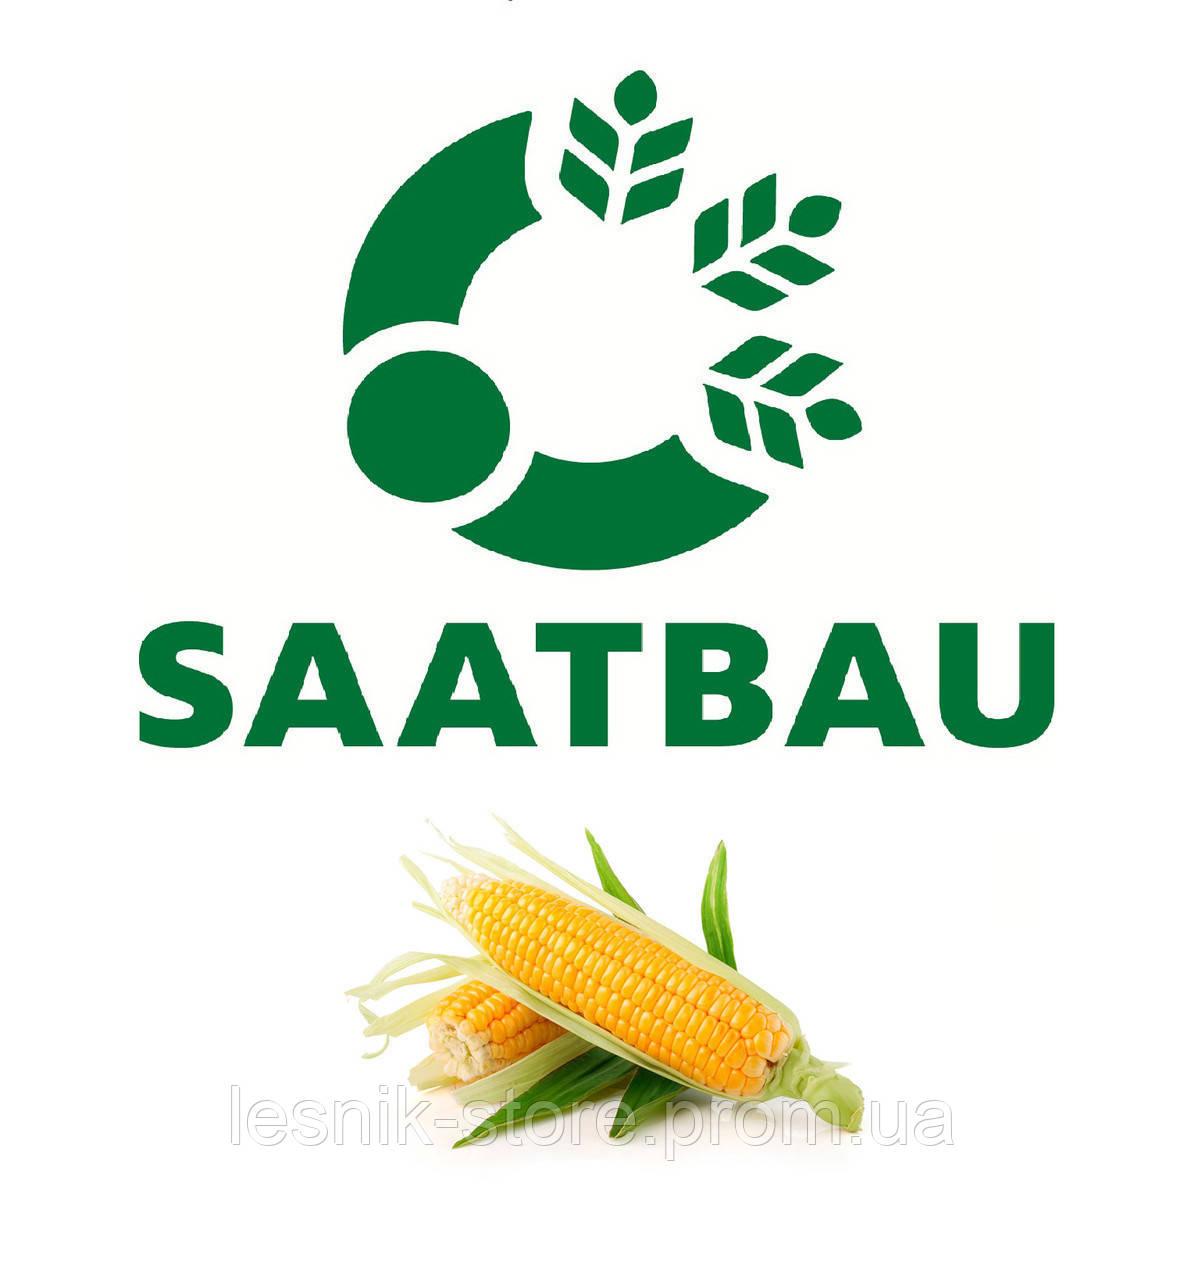 Семена кукурузы, Saatbau, Grimaldie